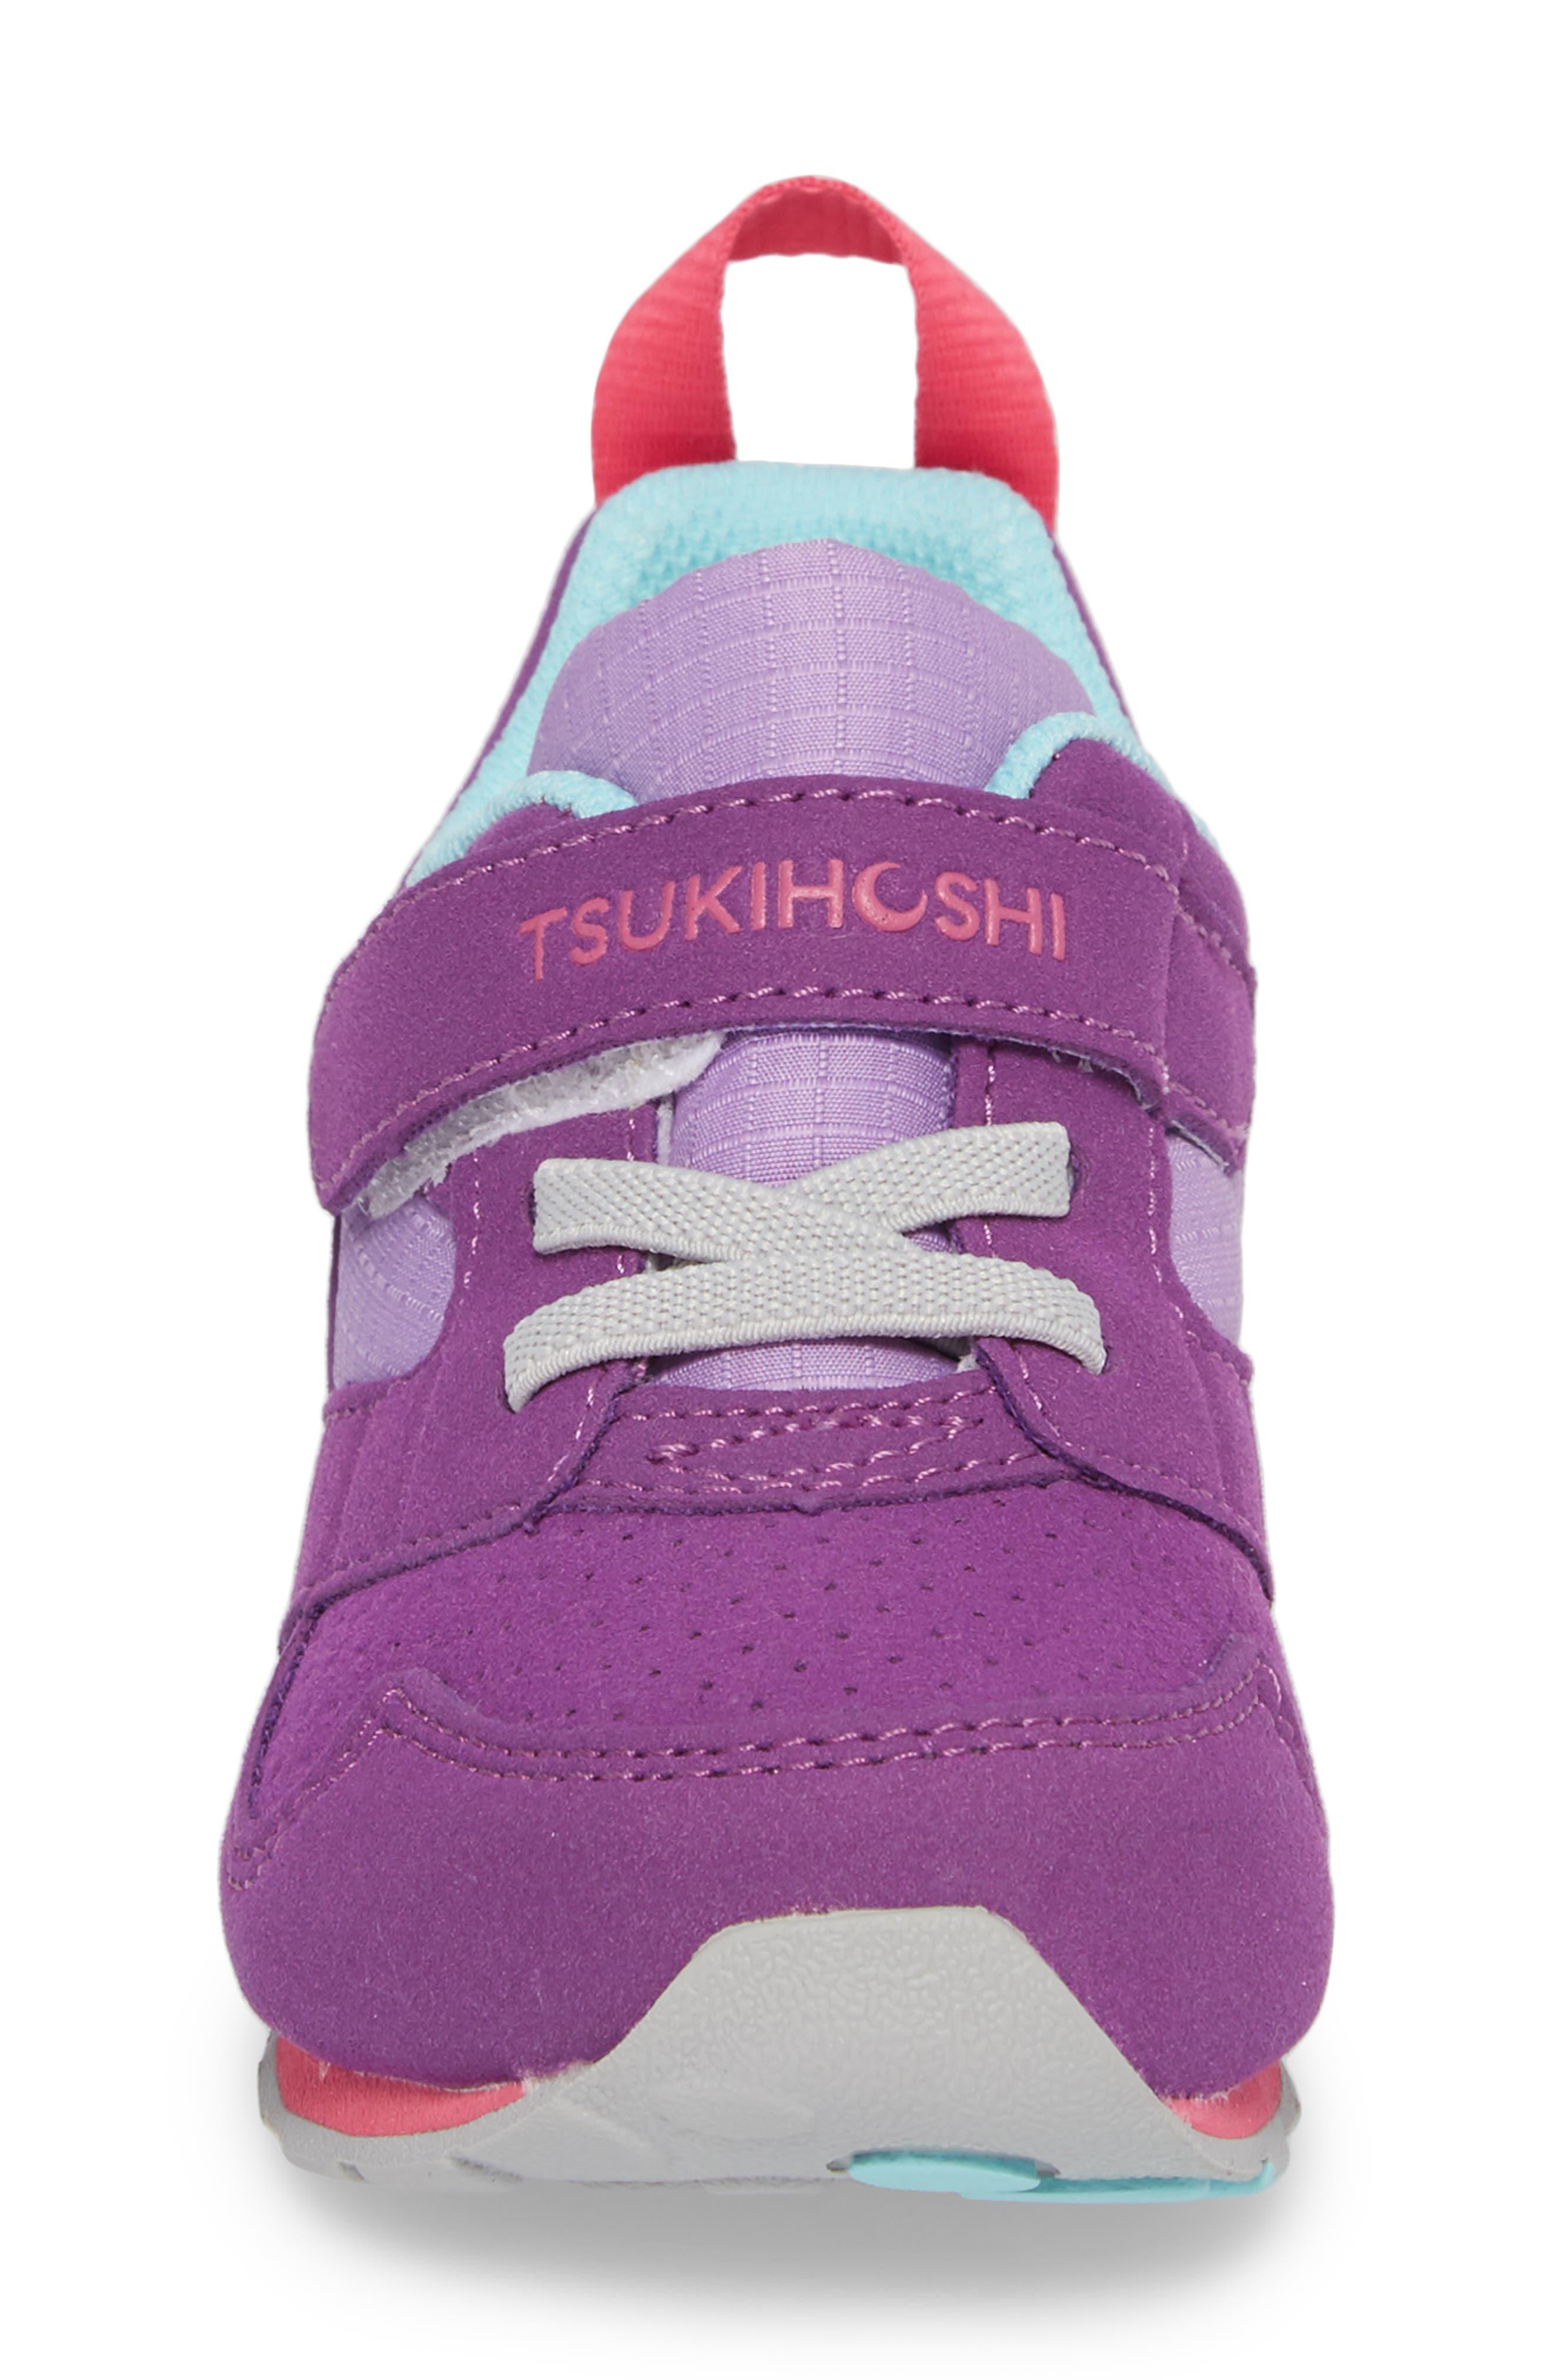 Alternate Image 4  - Tsukihoshi Racer Washable Sneaker (Walker, Toddler & Little Kid)